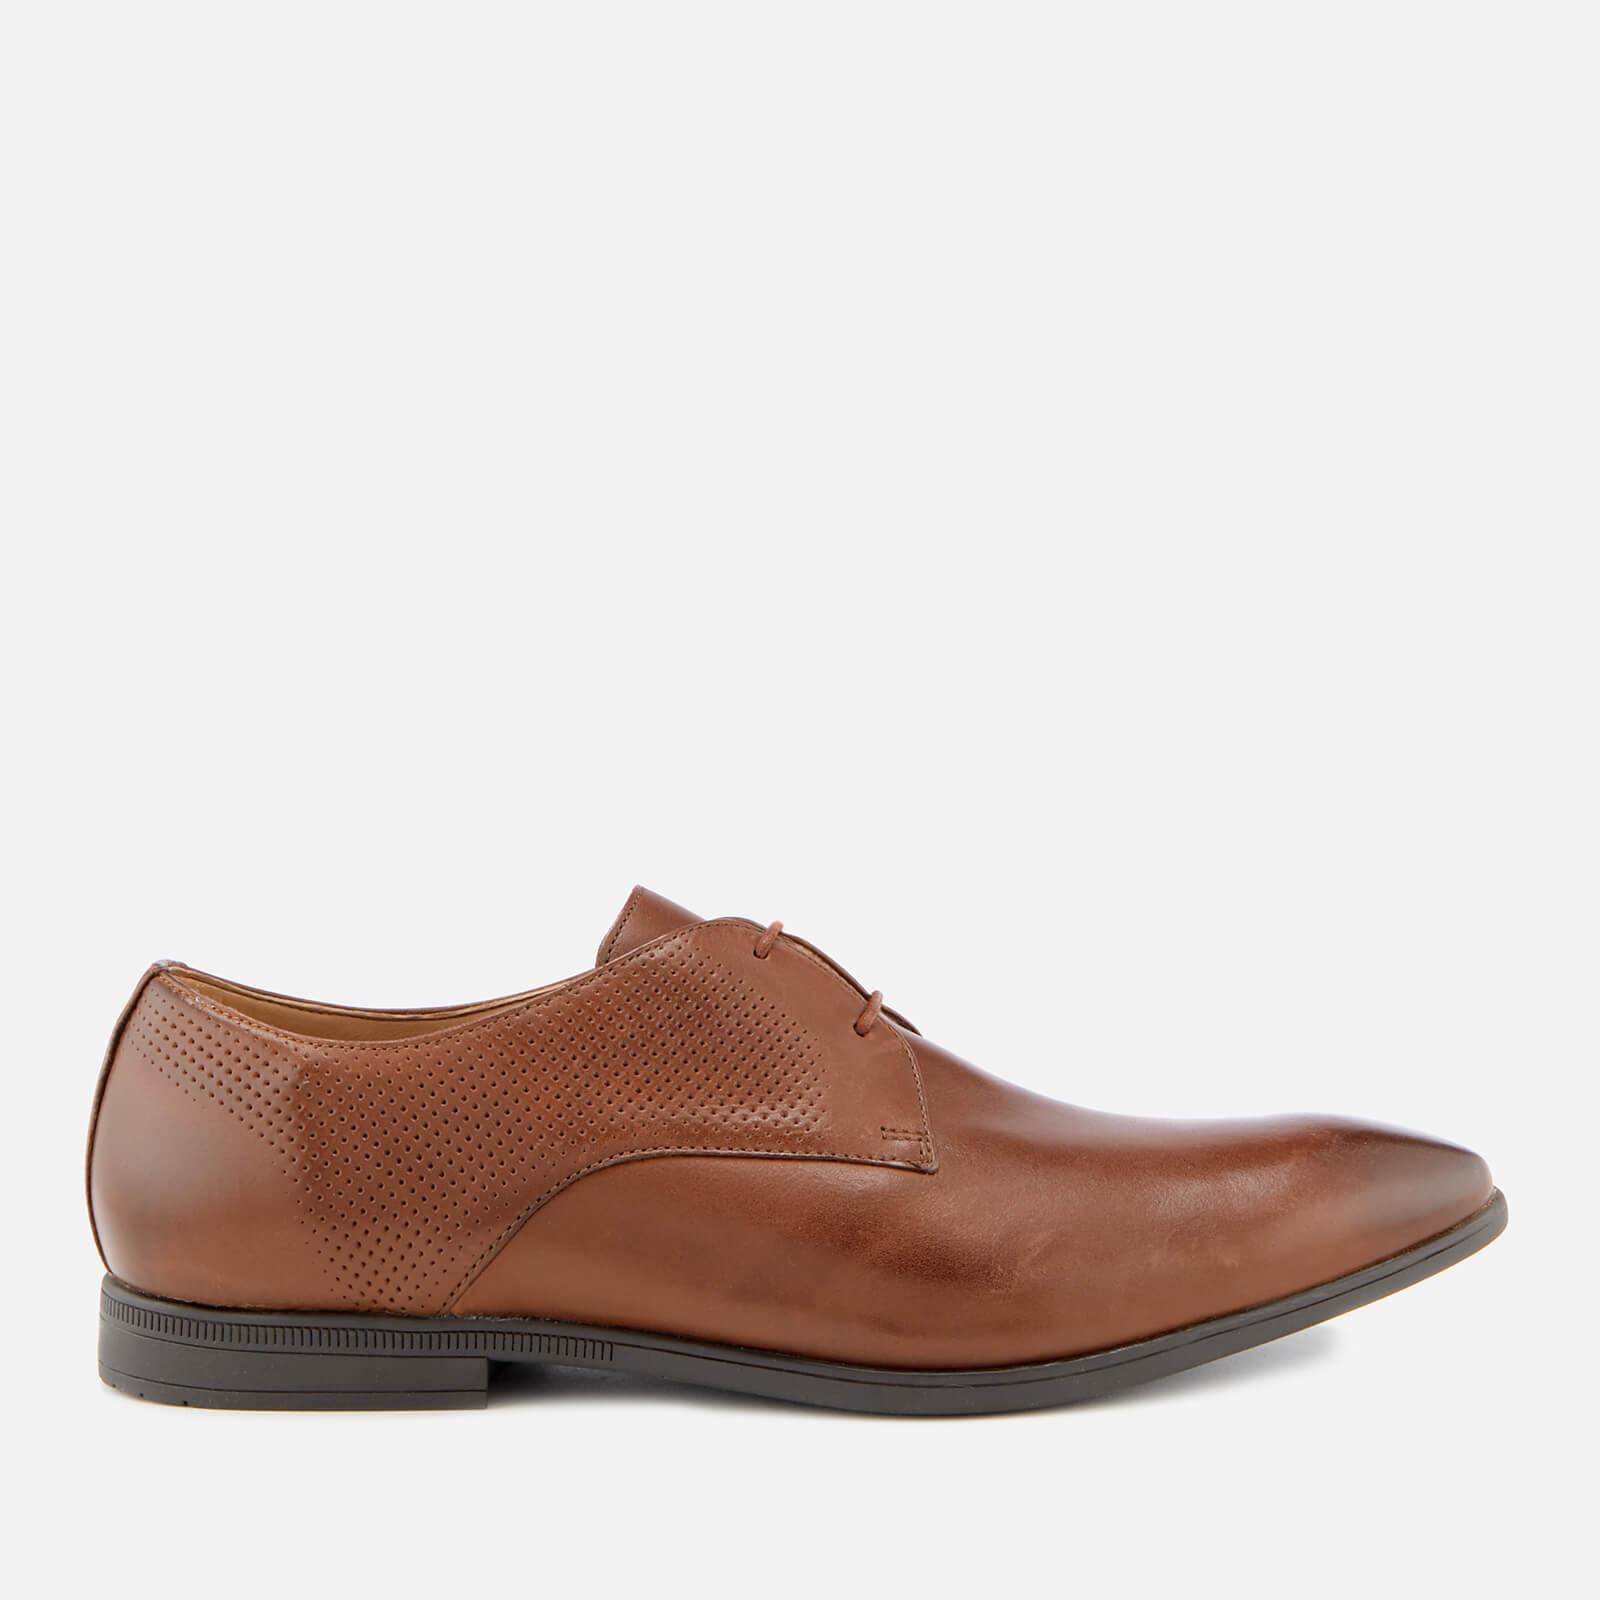 Clarks Men's Bampton Walk Leather Derby Shoes - British Tan - UK 9 - Tan/Brown